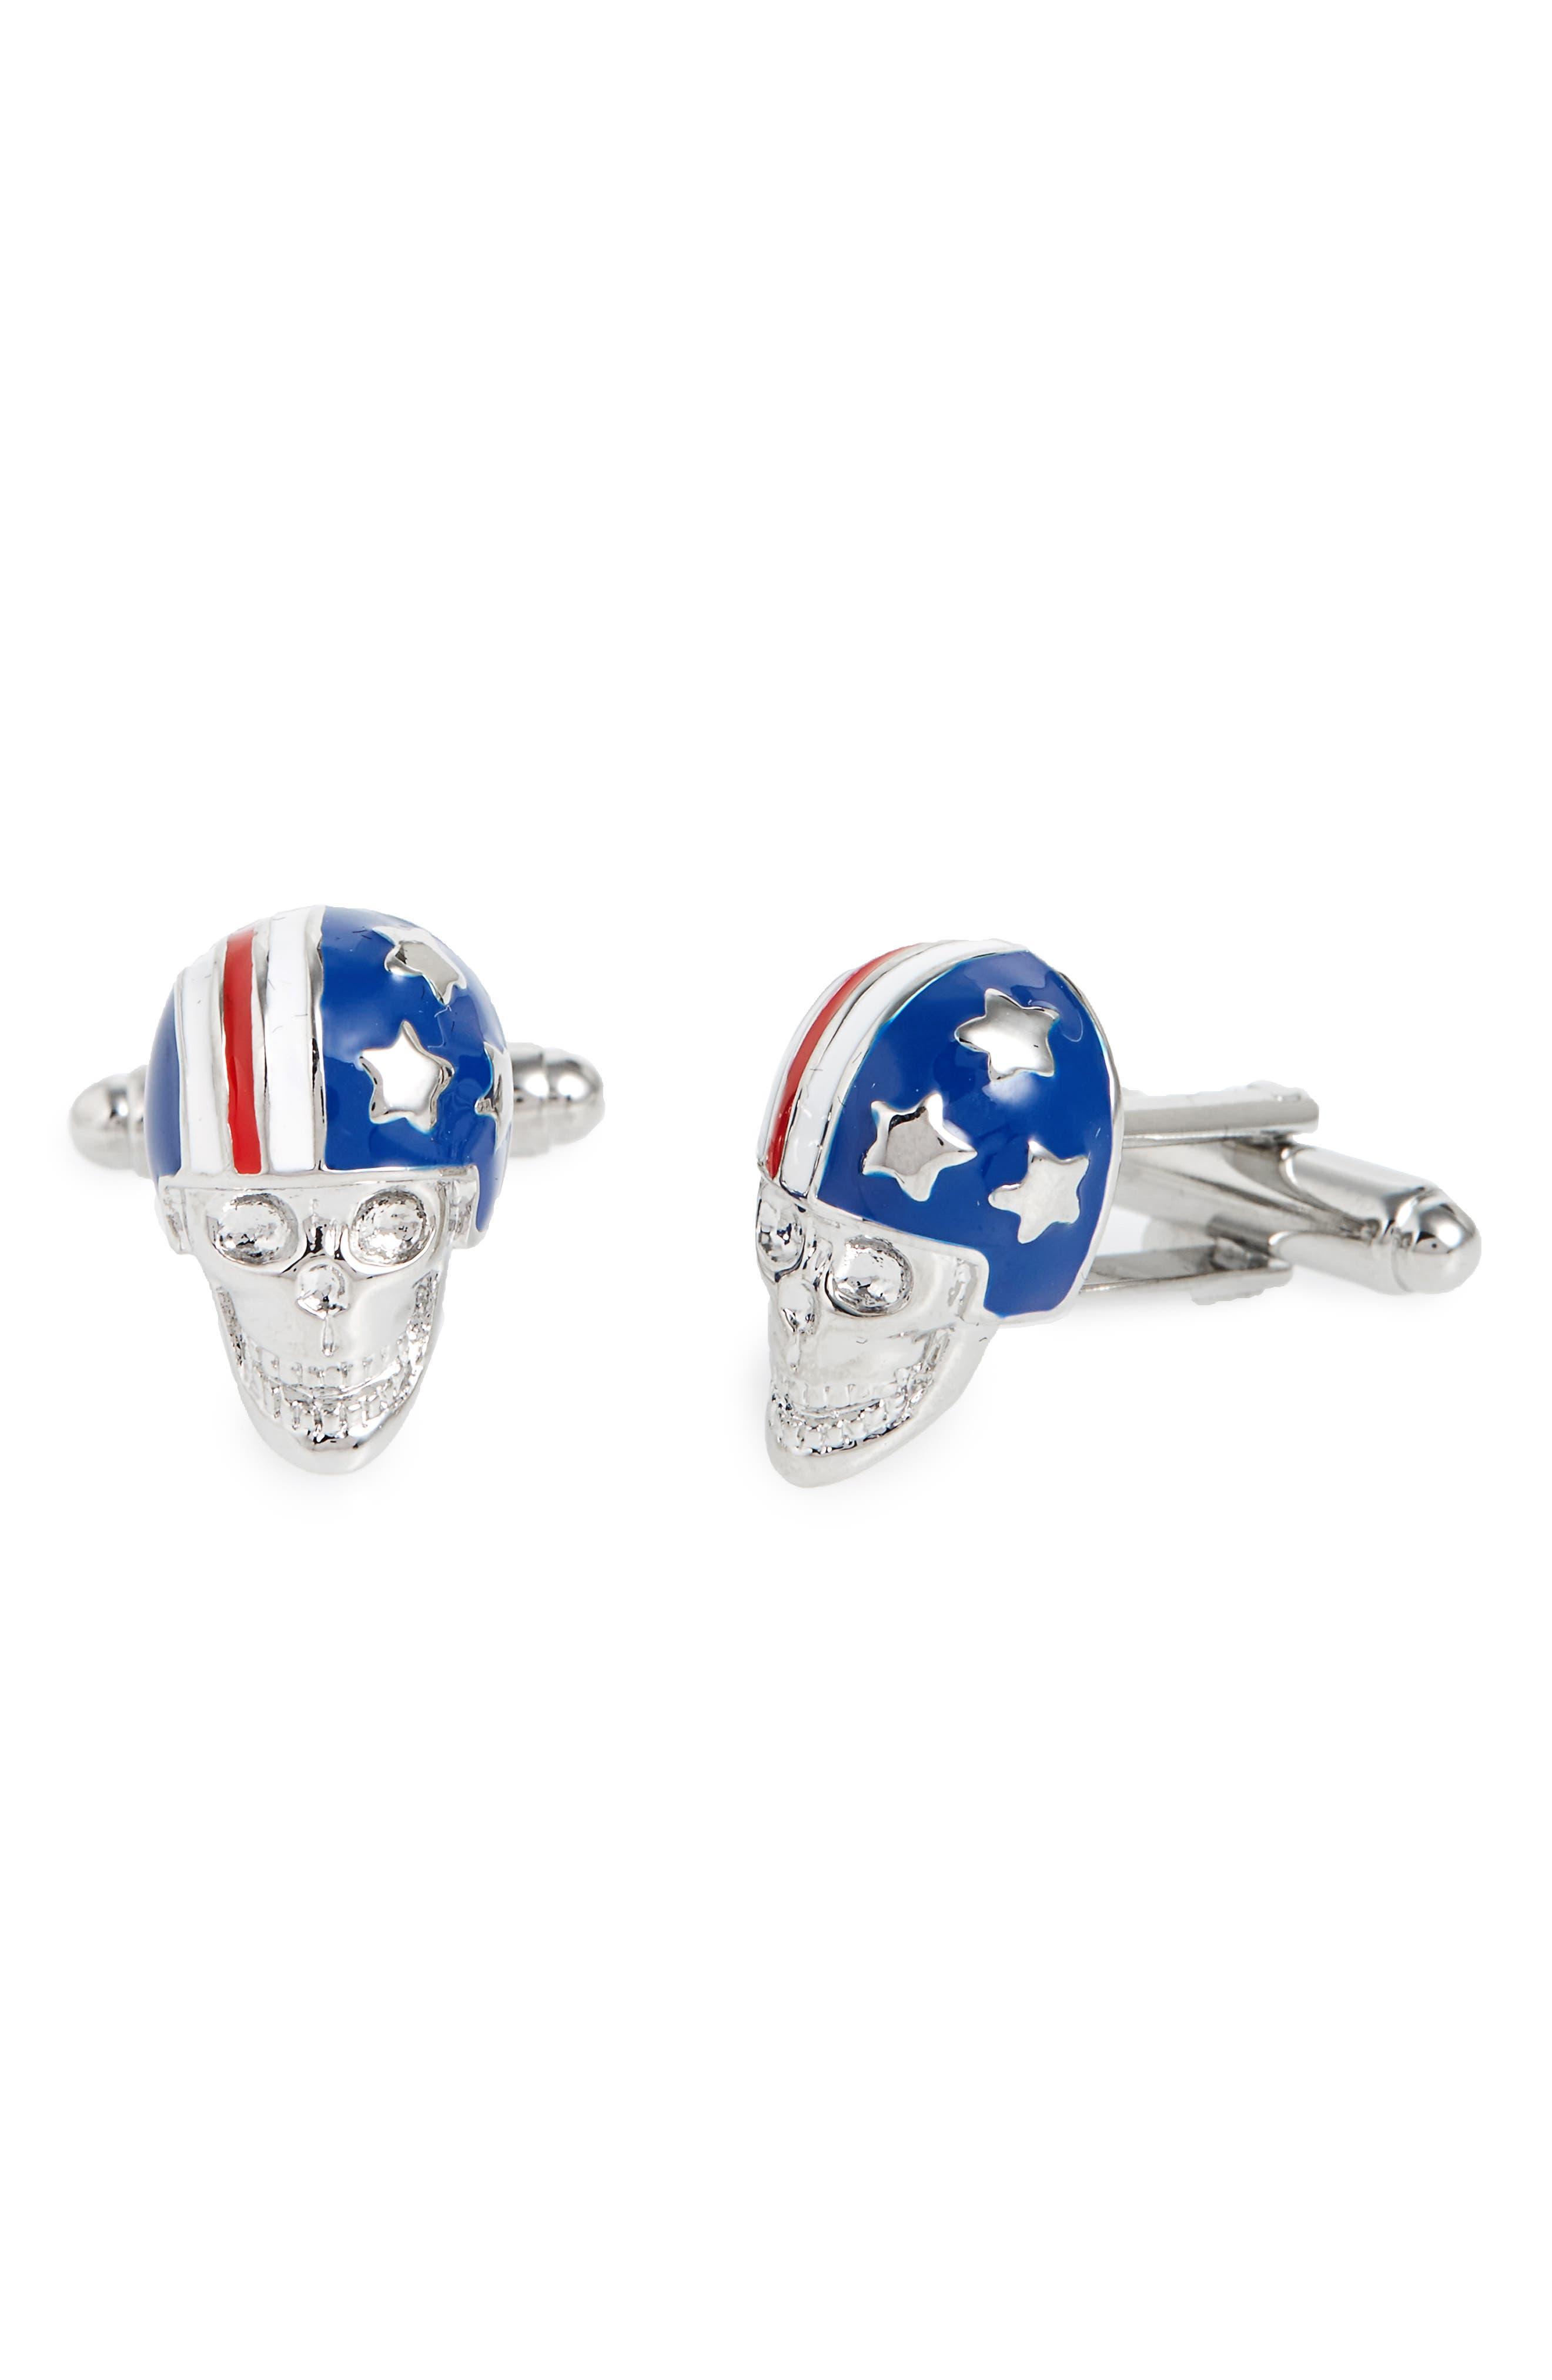 Link Up Flag Helmet Cuff Links